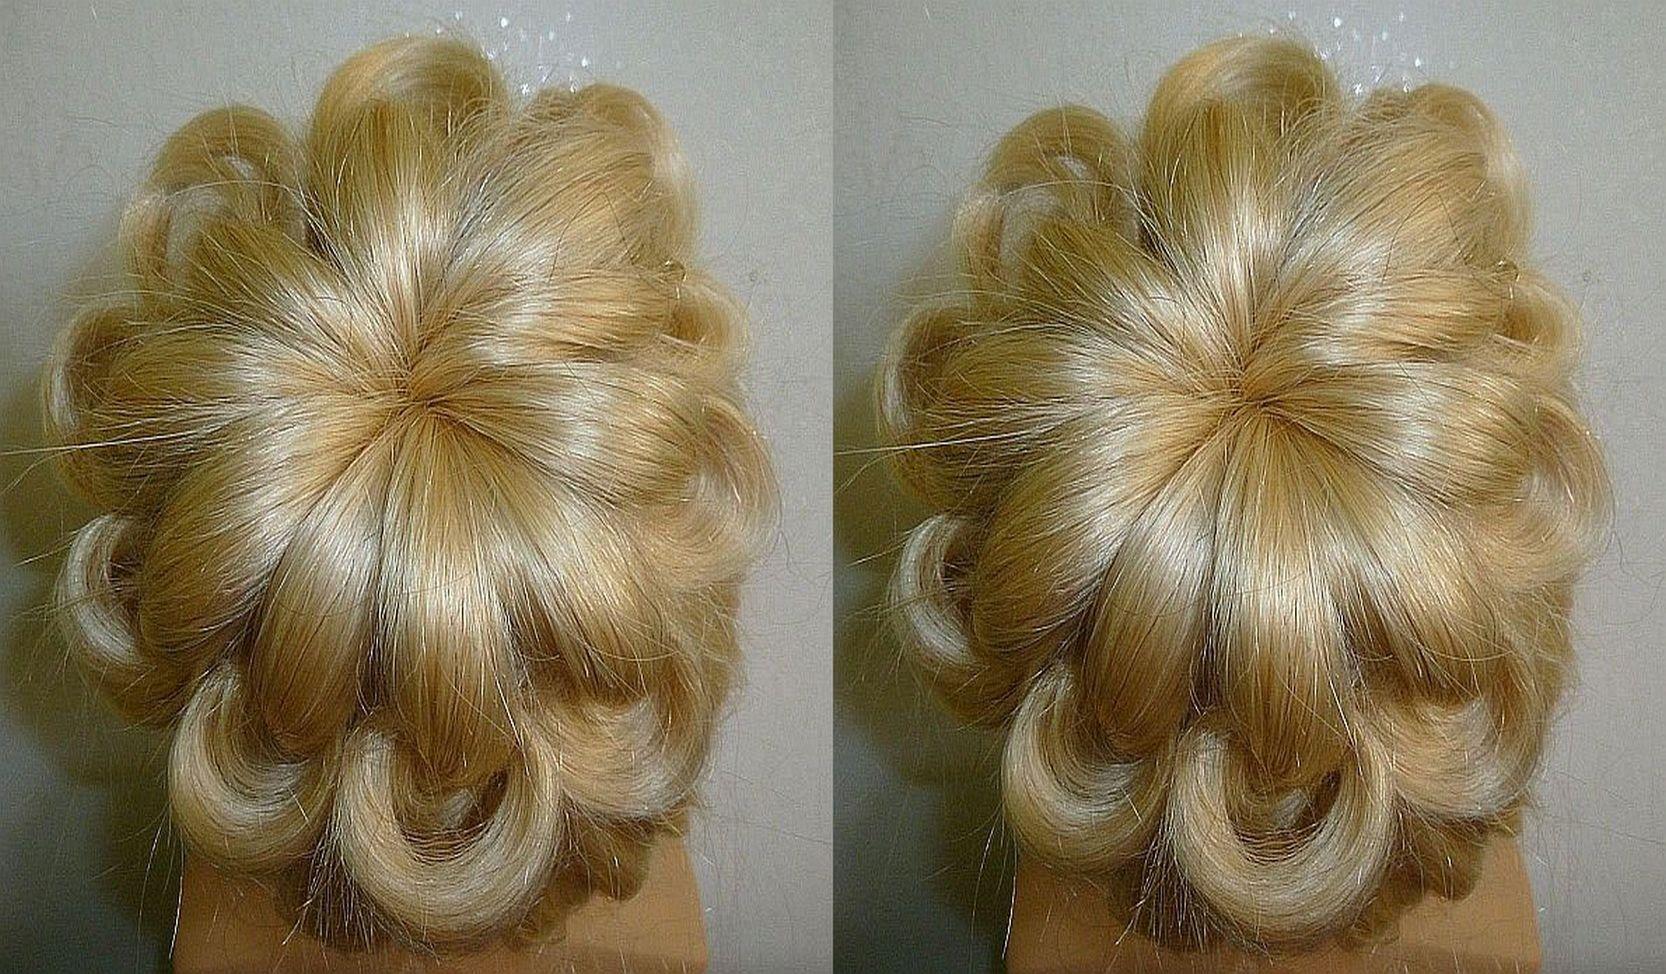 Easy Und Quick Promwedding Hairstyleevening Updo Hairstyles